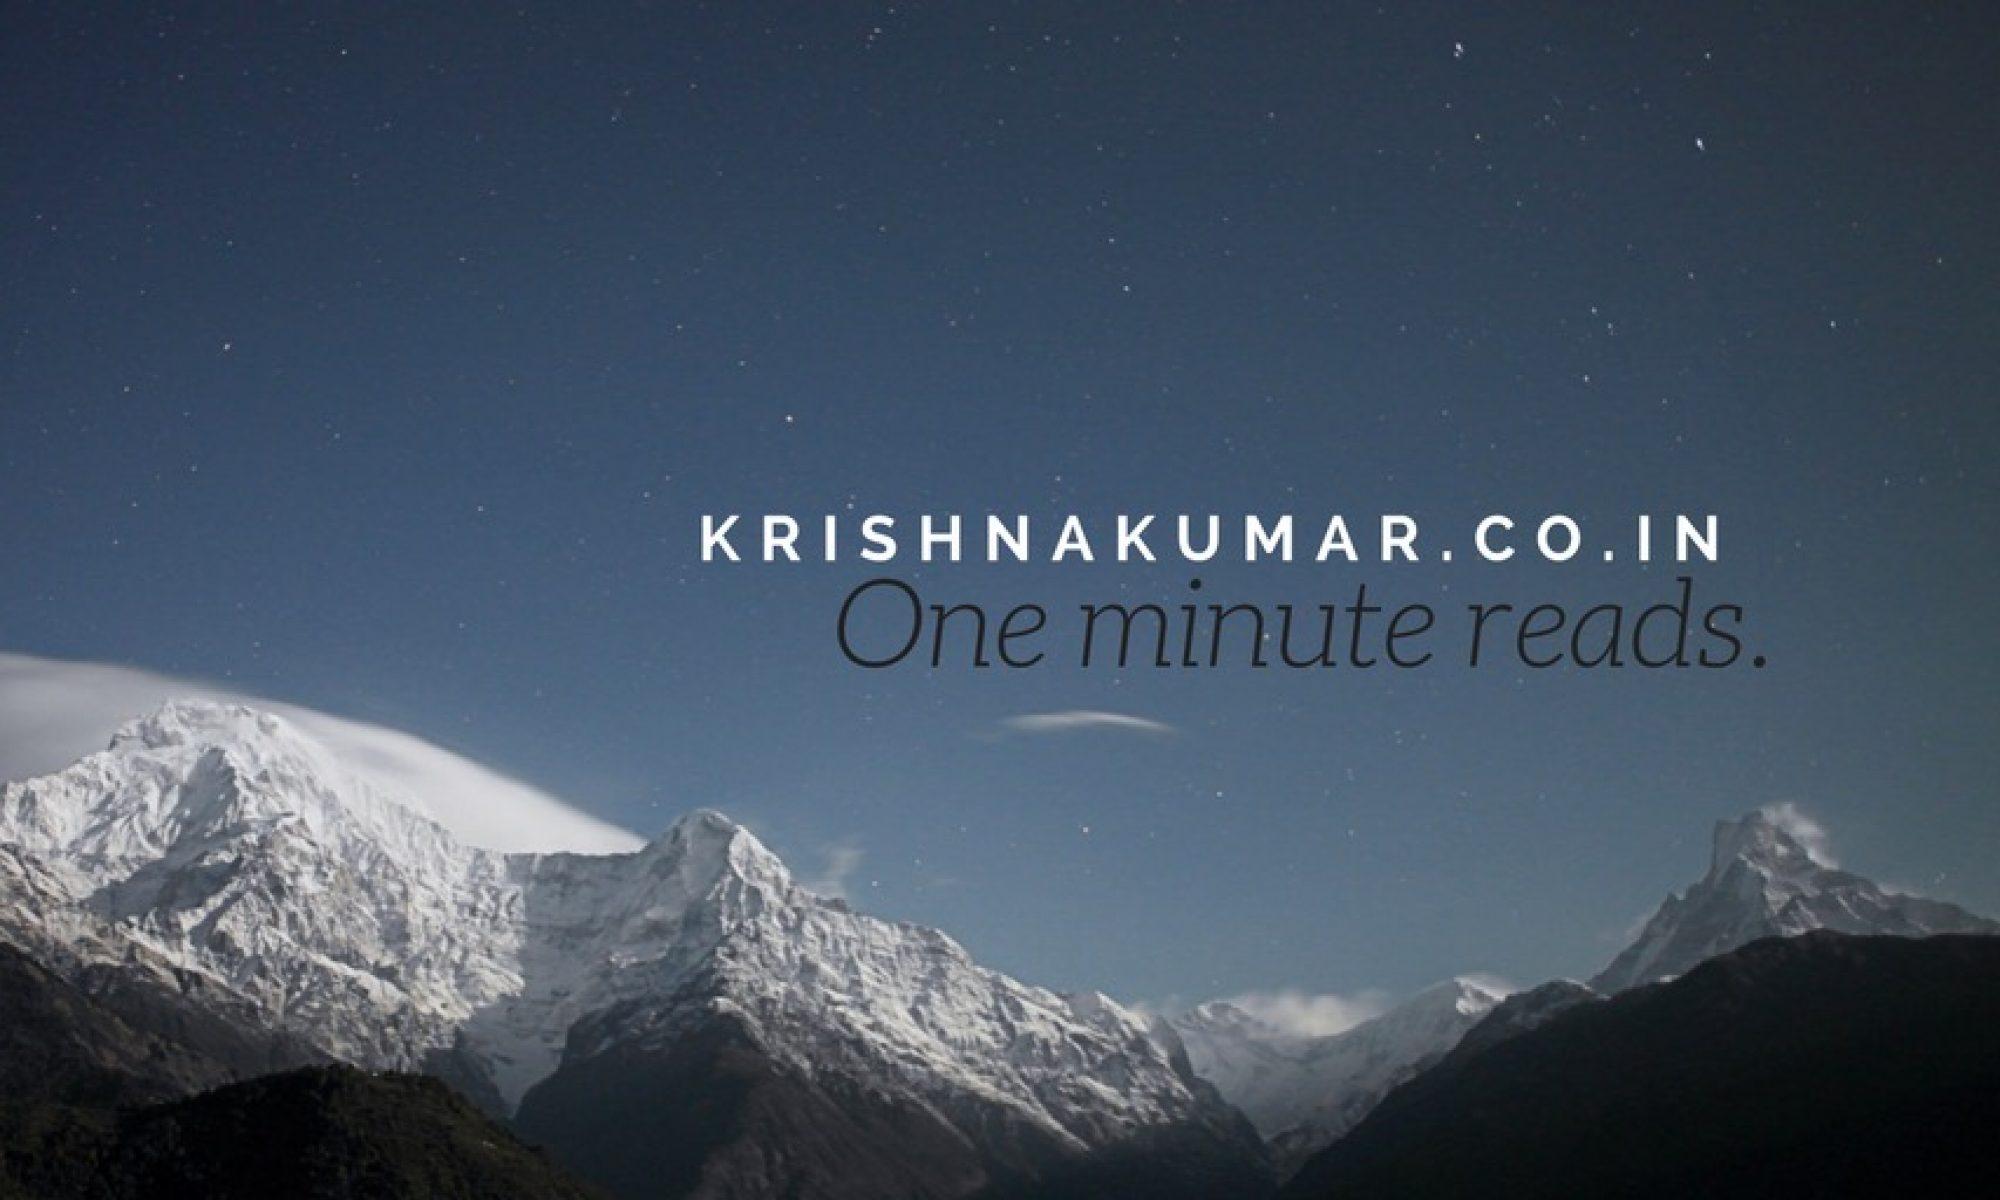 Krishna Kumar (KK)